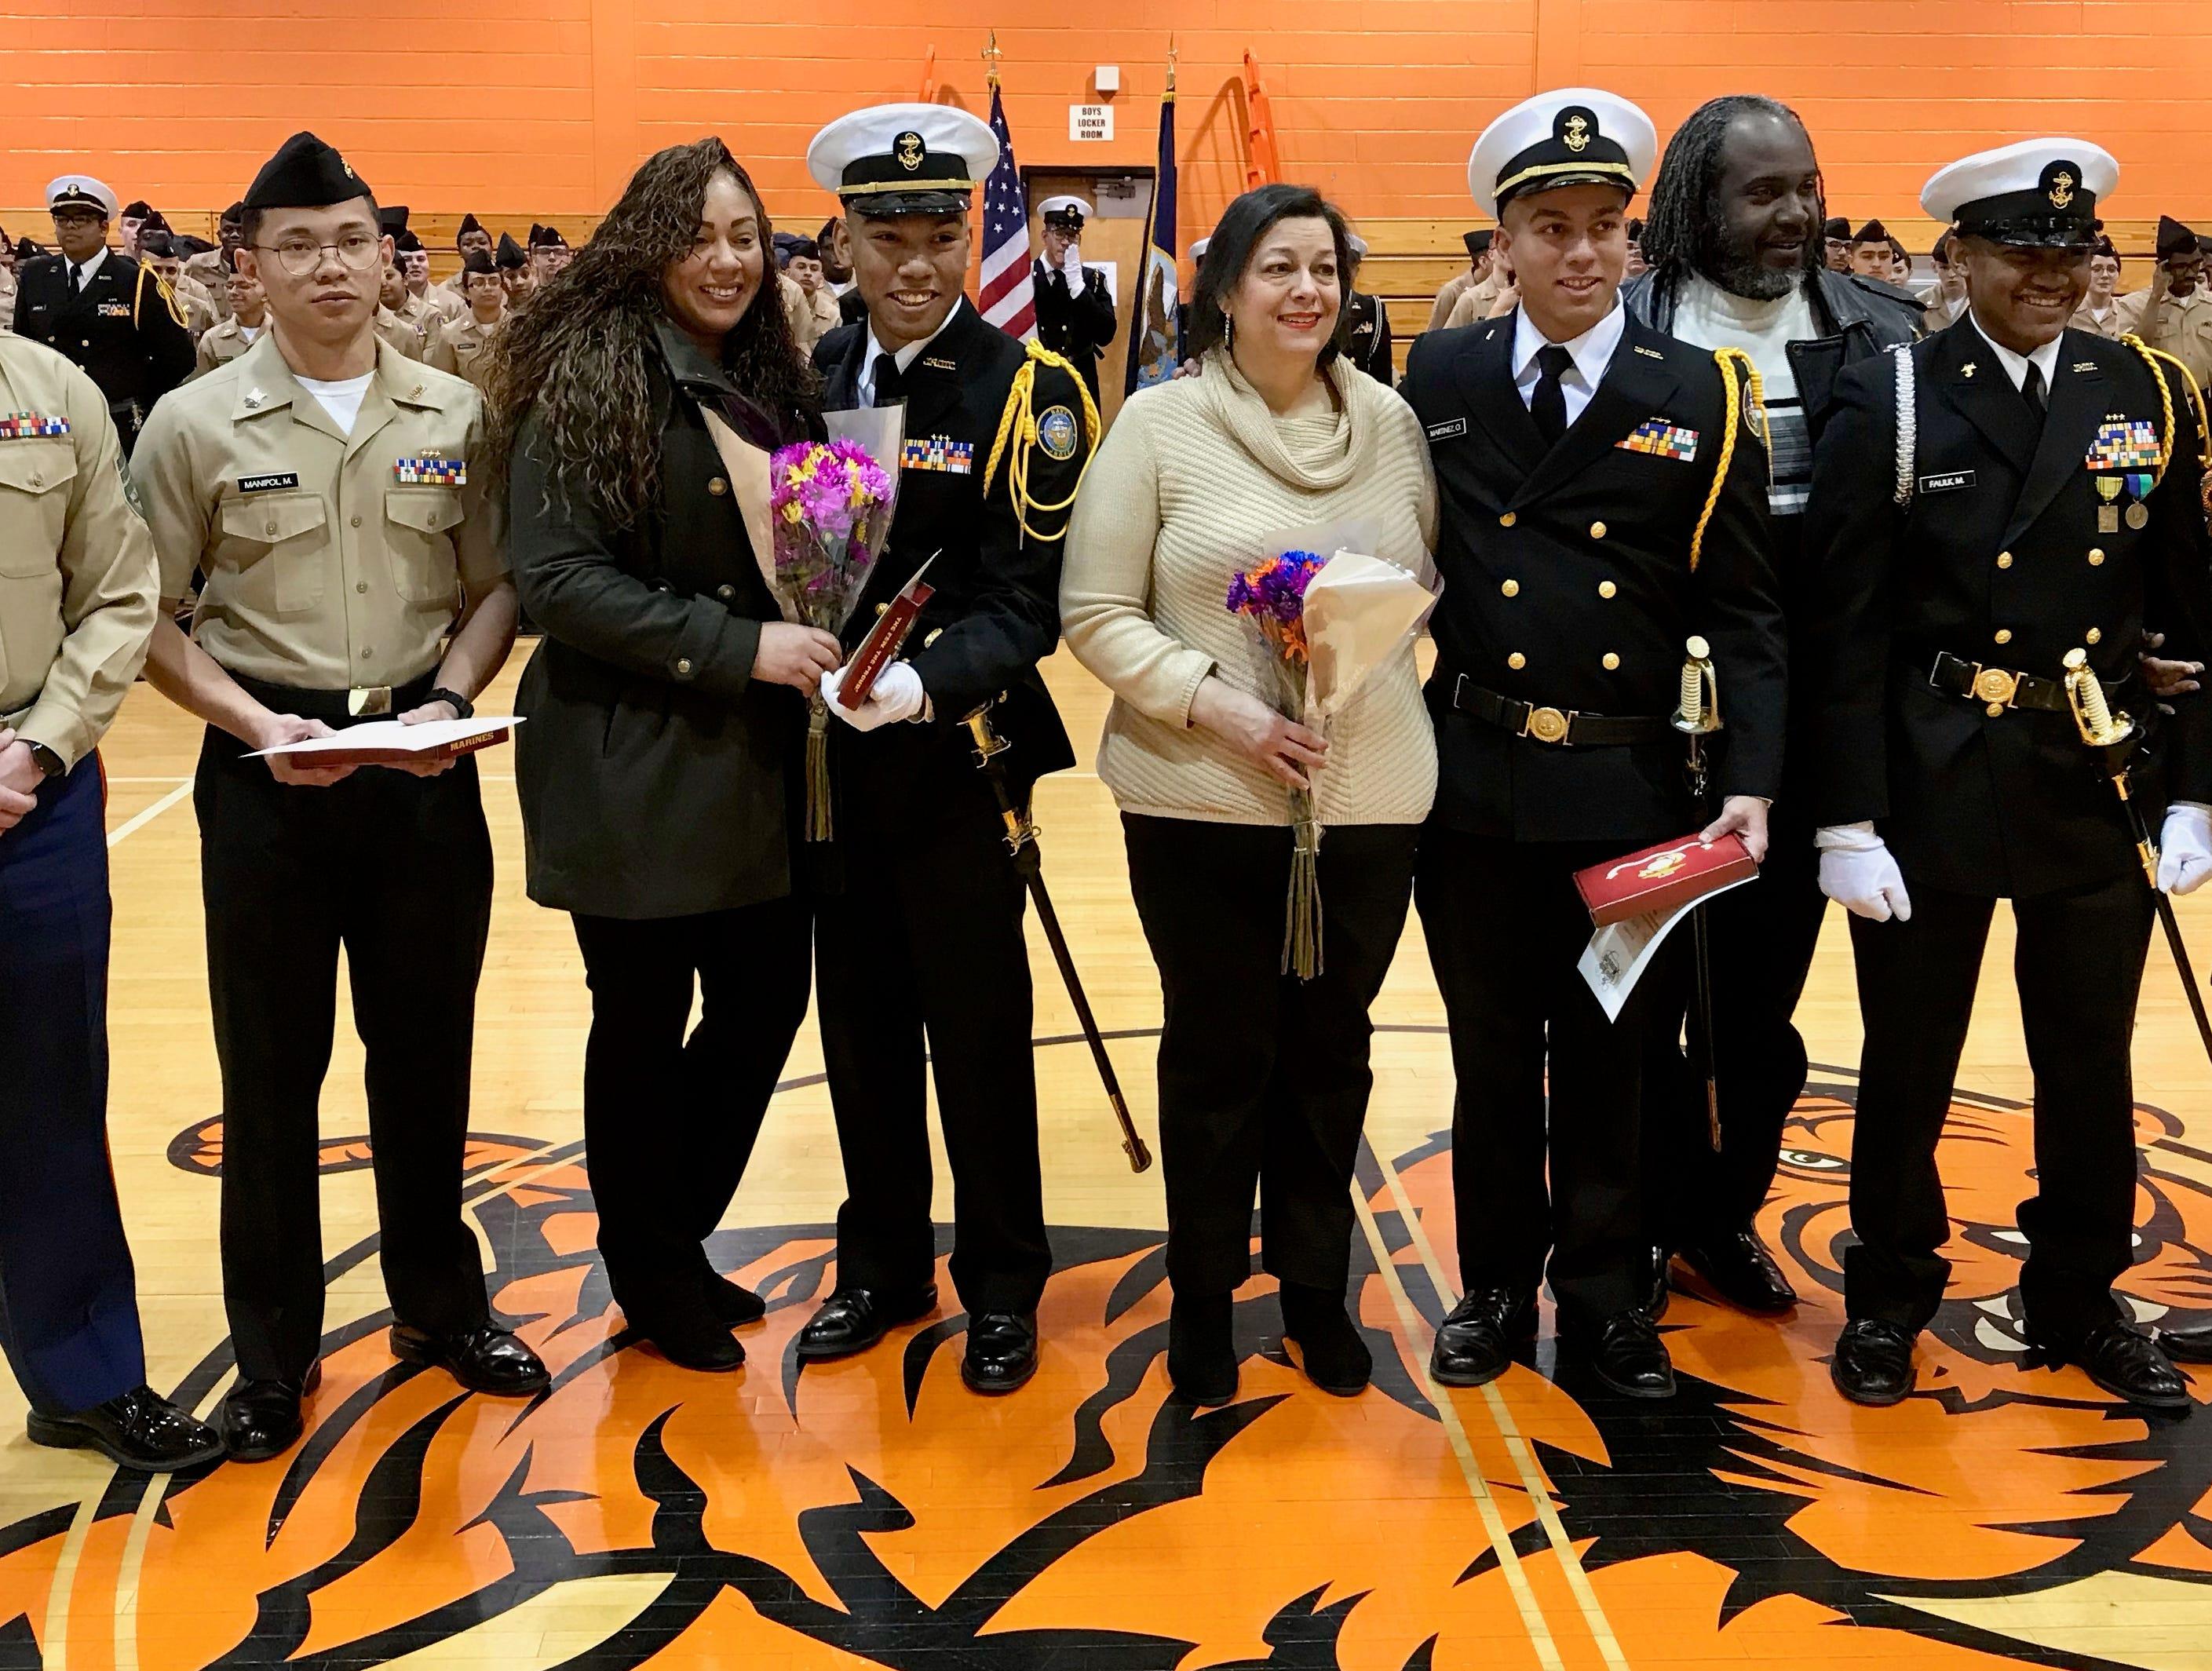 Linden High School NJROTC Marine recruits with recruiter Staff Sgt. Harry Gitlitz, left, and their parents.